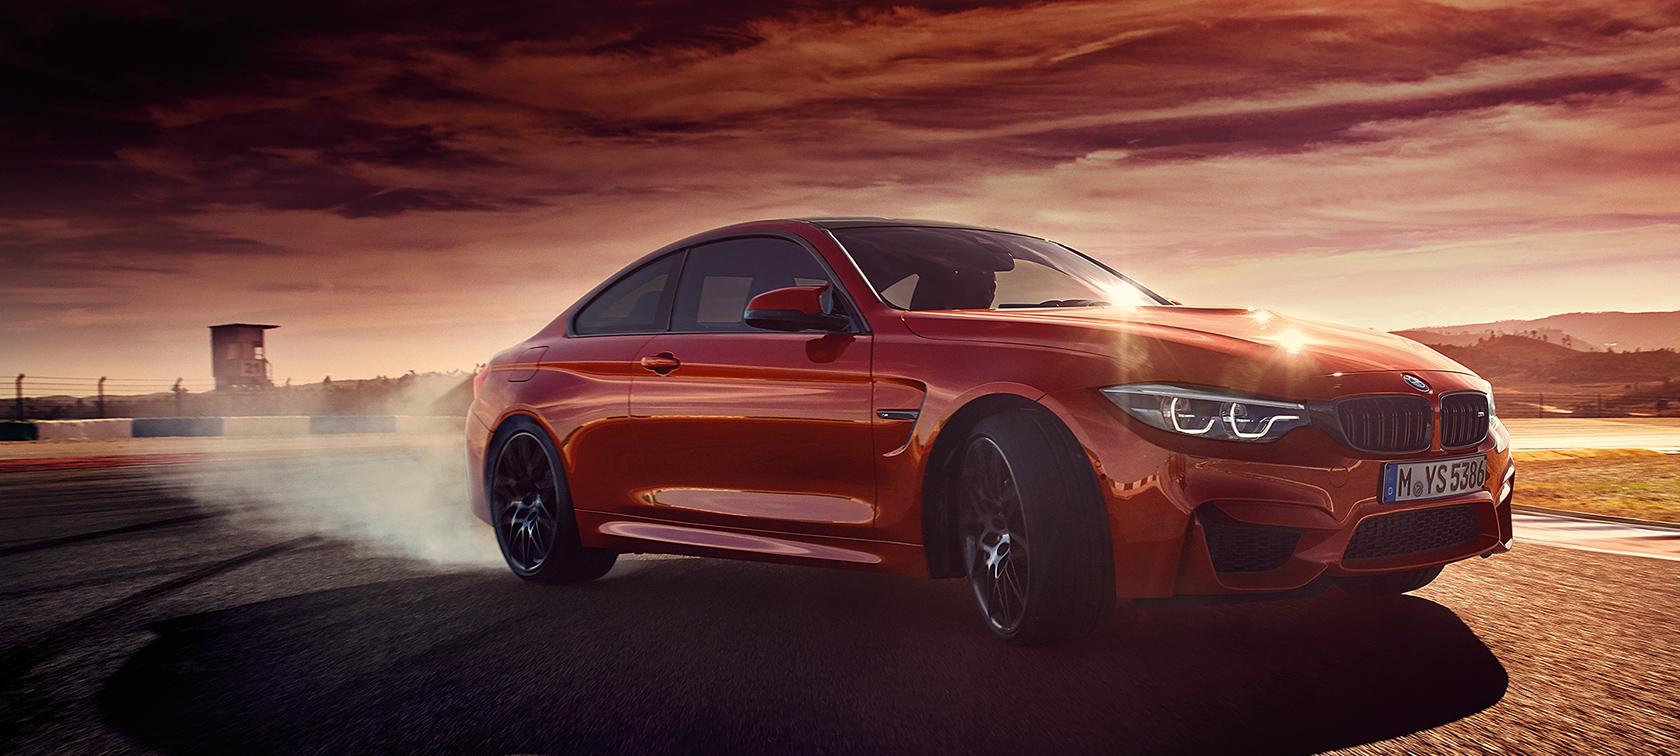 BMW M4 Coupé : Yleisesittely